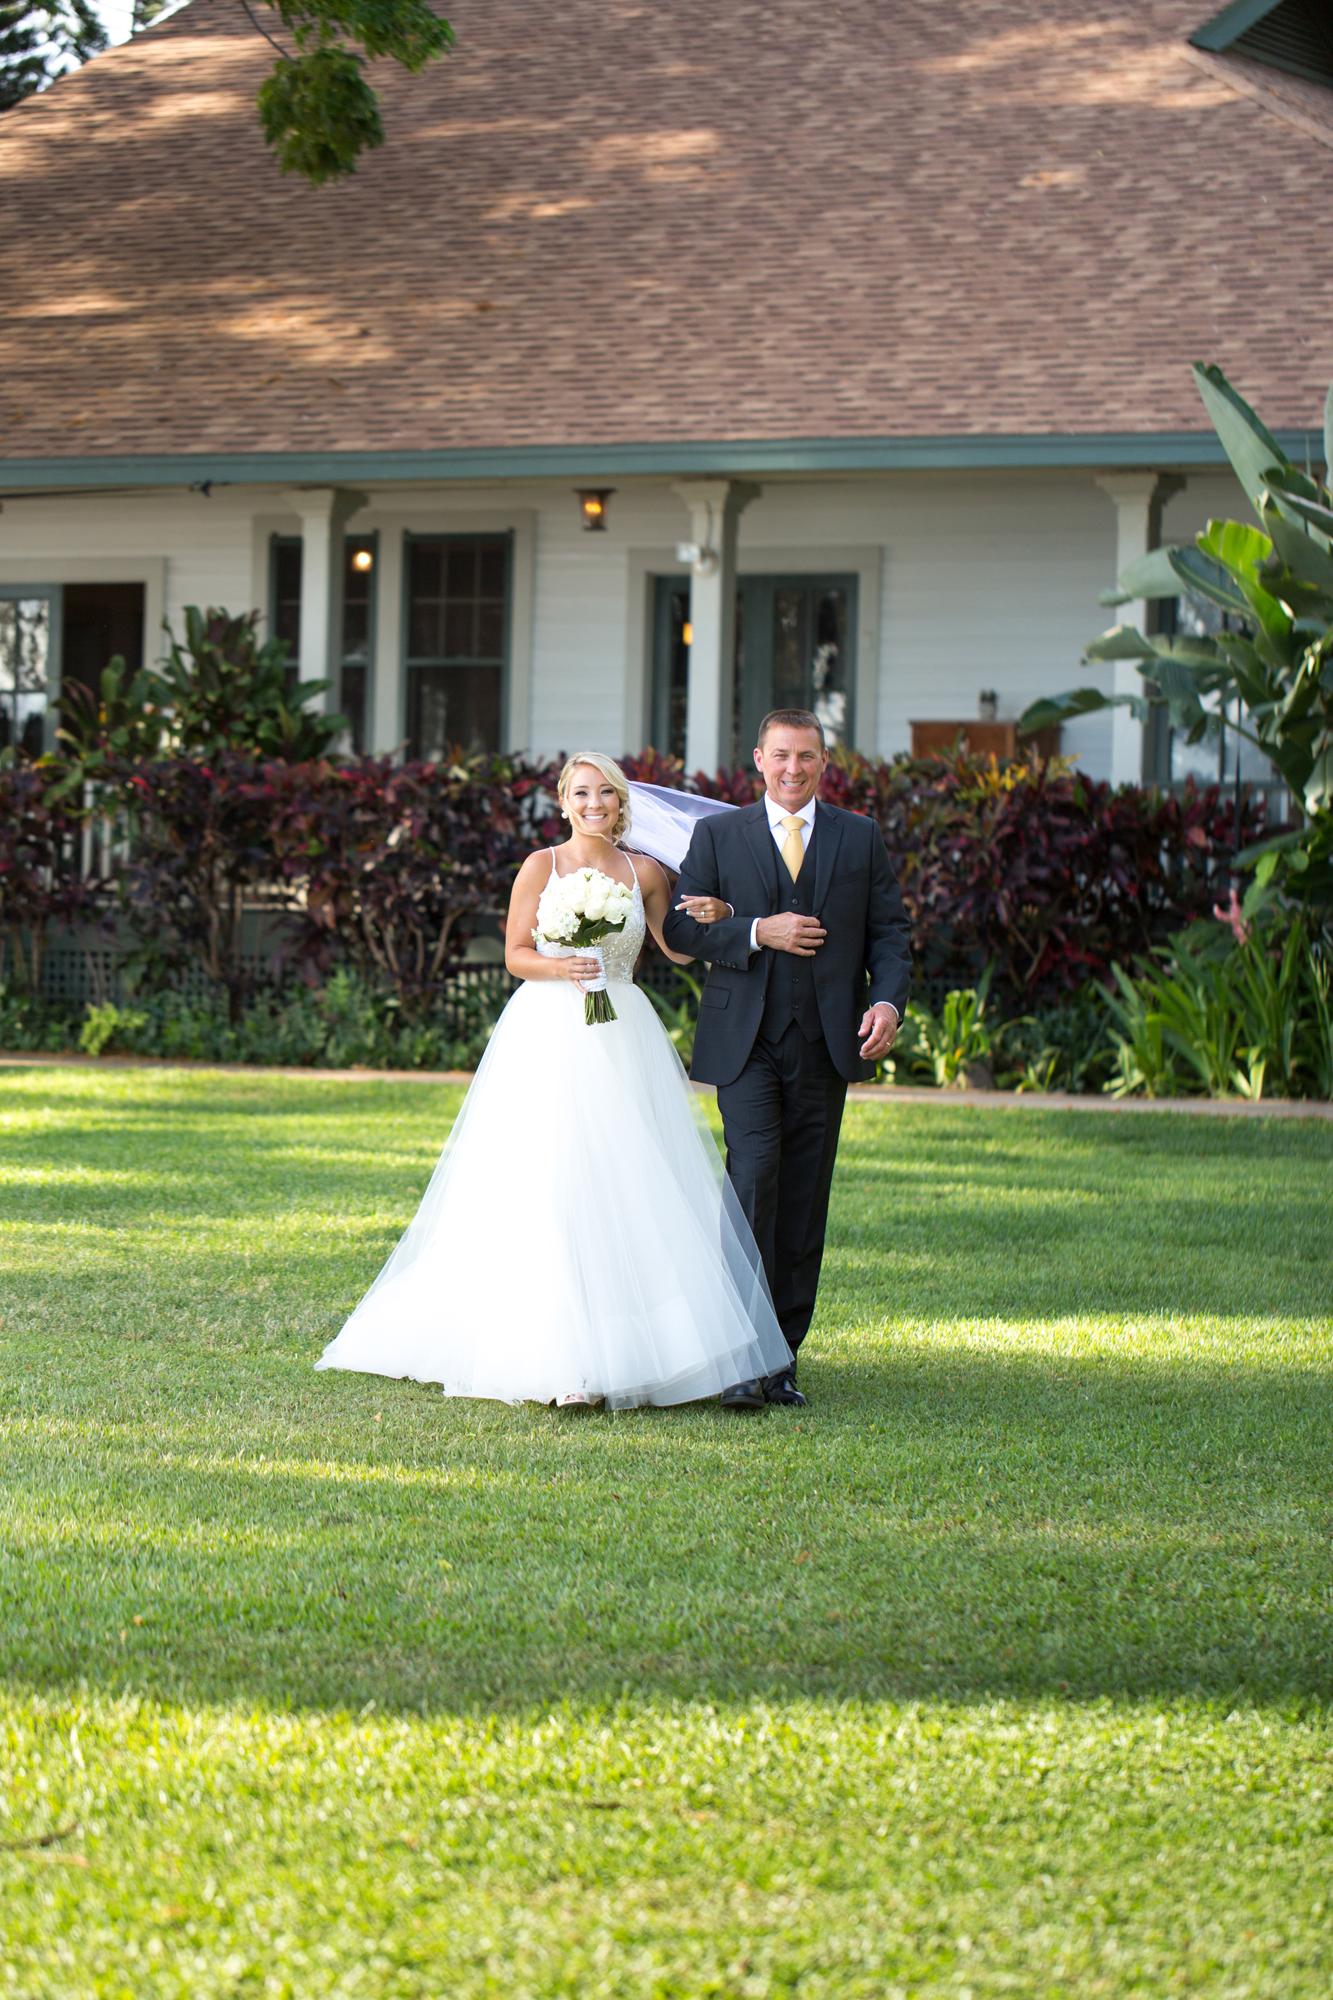 Maui Wedding At Olowalu Plantation House